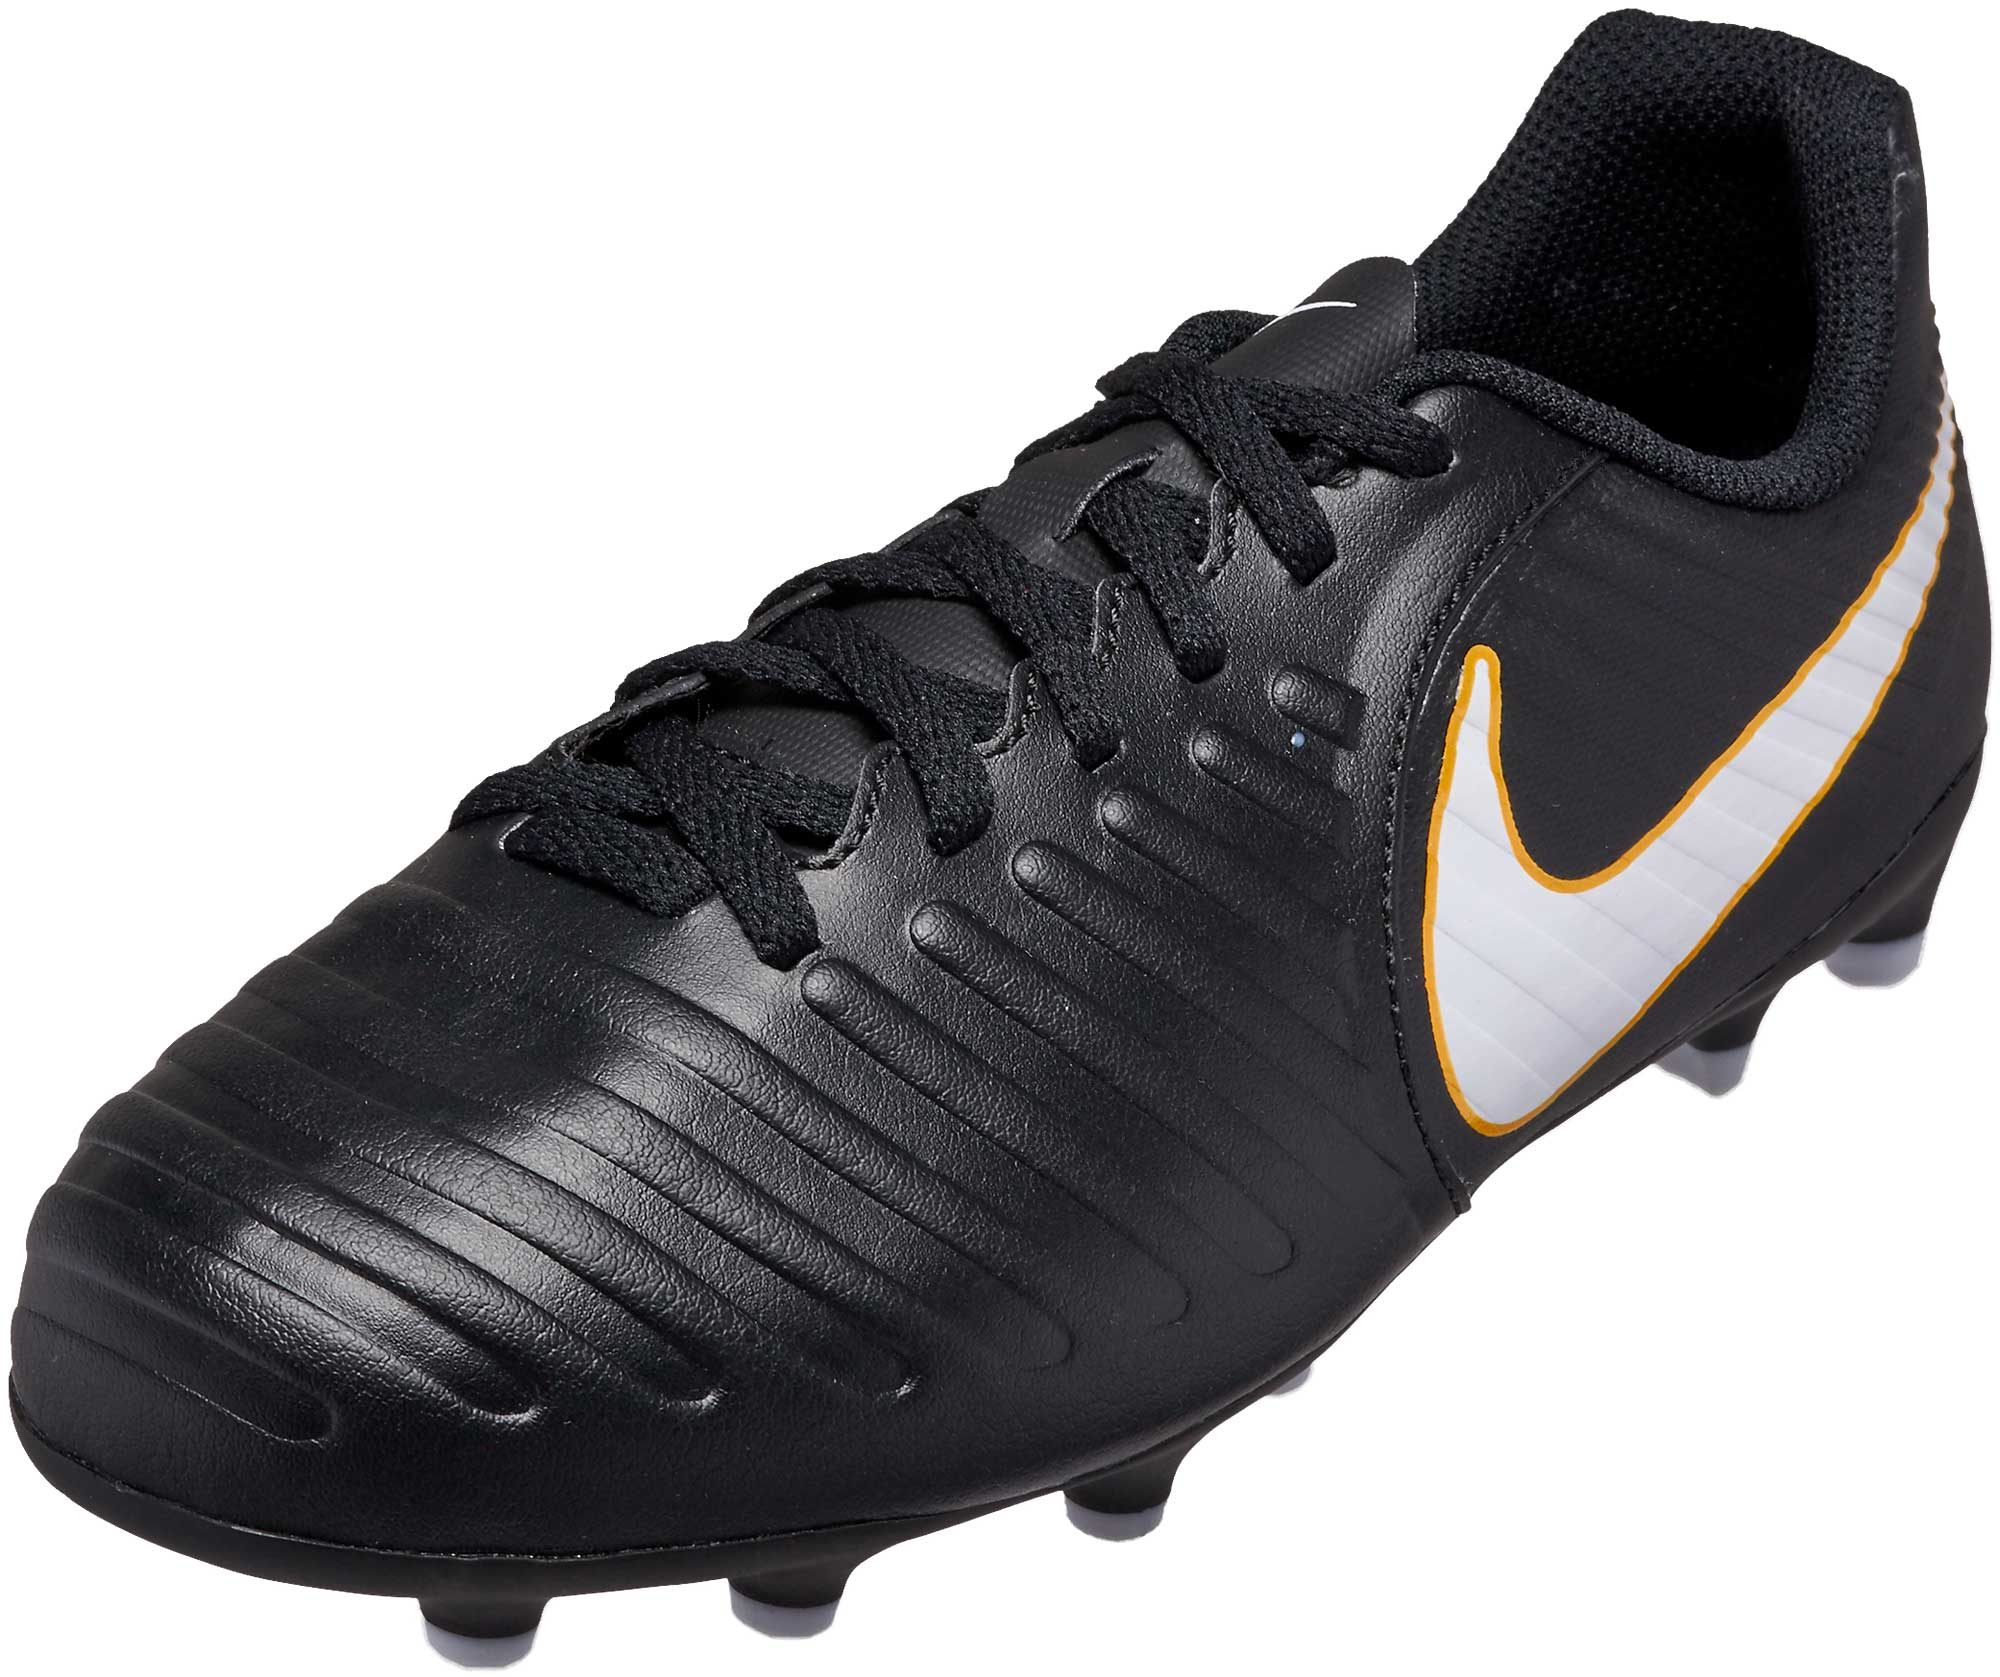 d24abb3bc83f26 Nike Kids Tiempo Rio IV FG Soccer Cleats - Black   White - Soccer ...